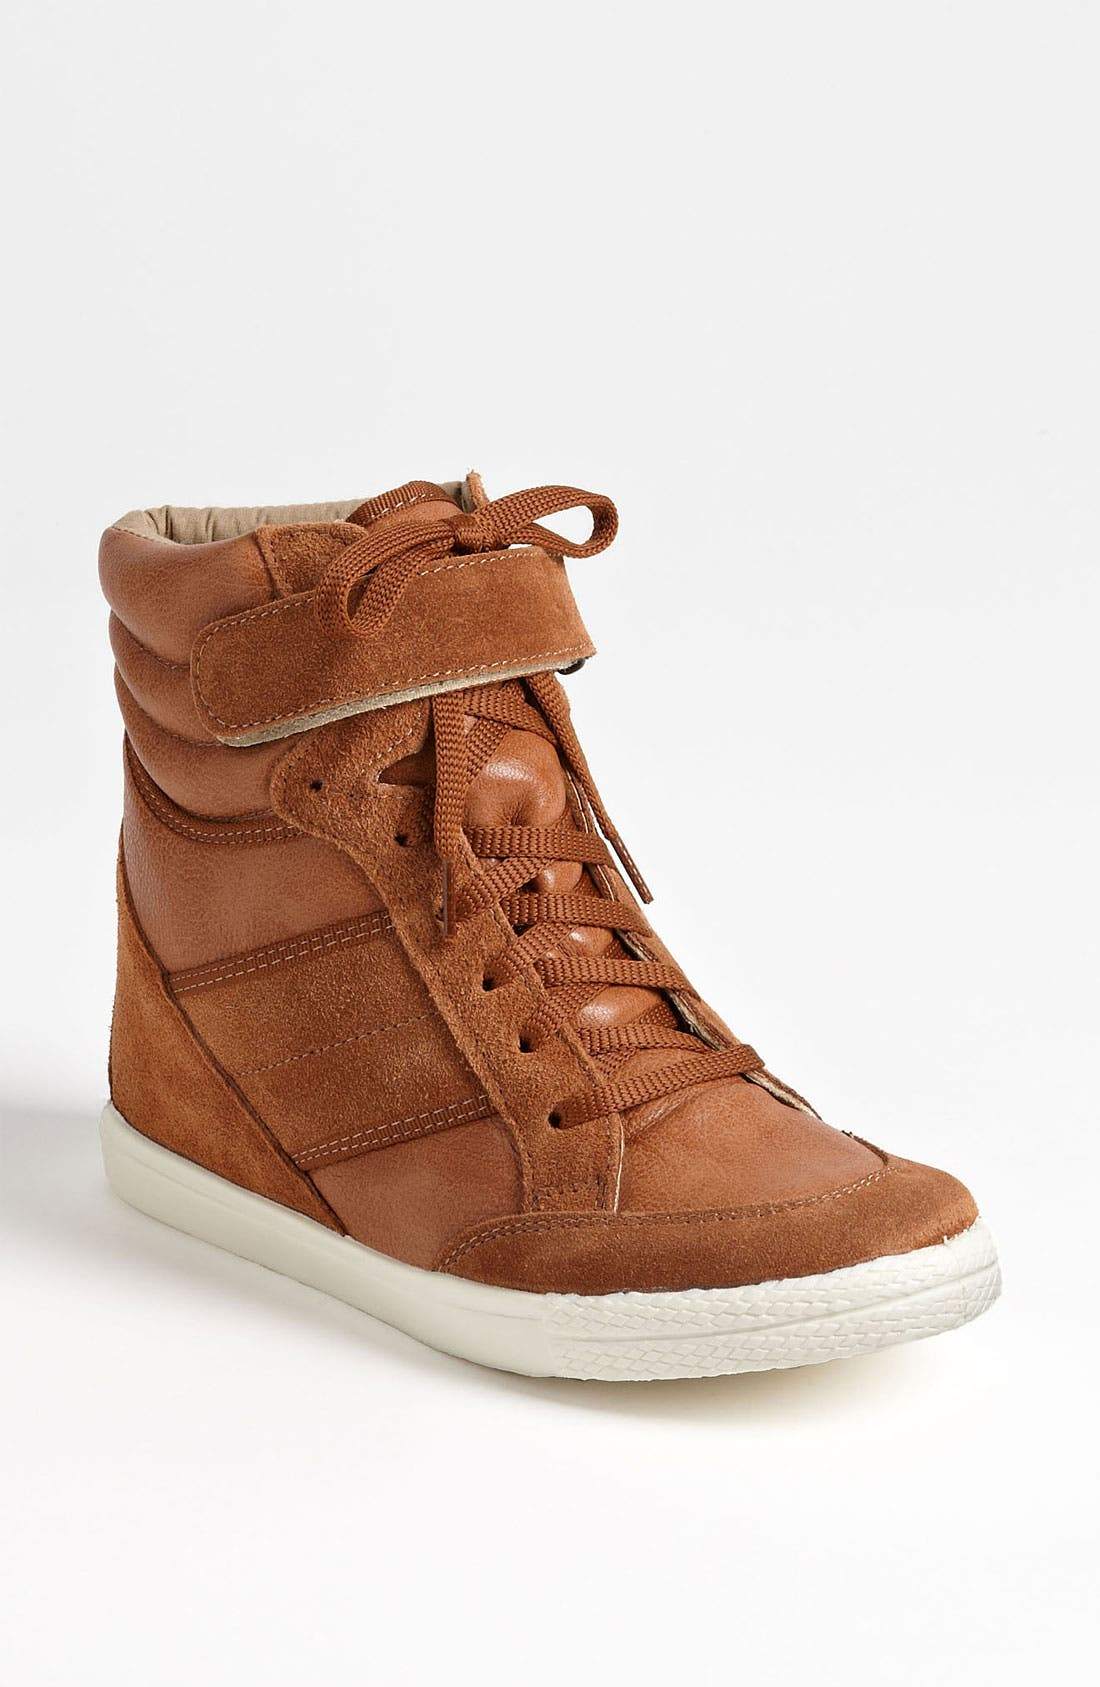 Main Image - Topshop 'Aerobic2' Wedge Sneaker